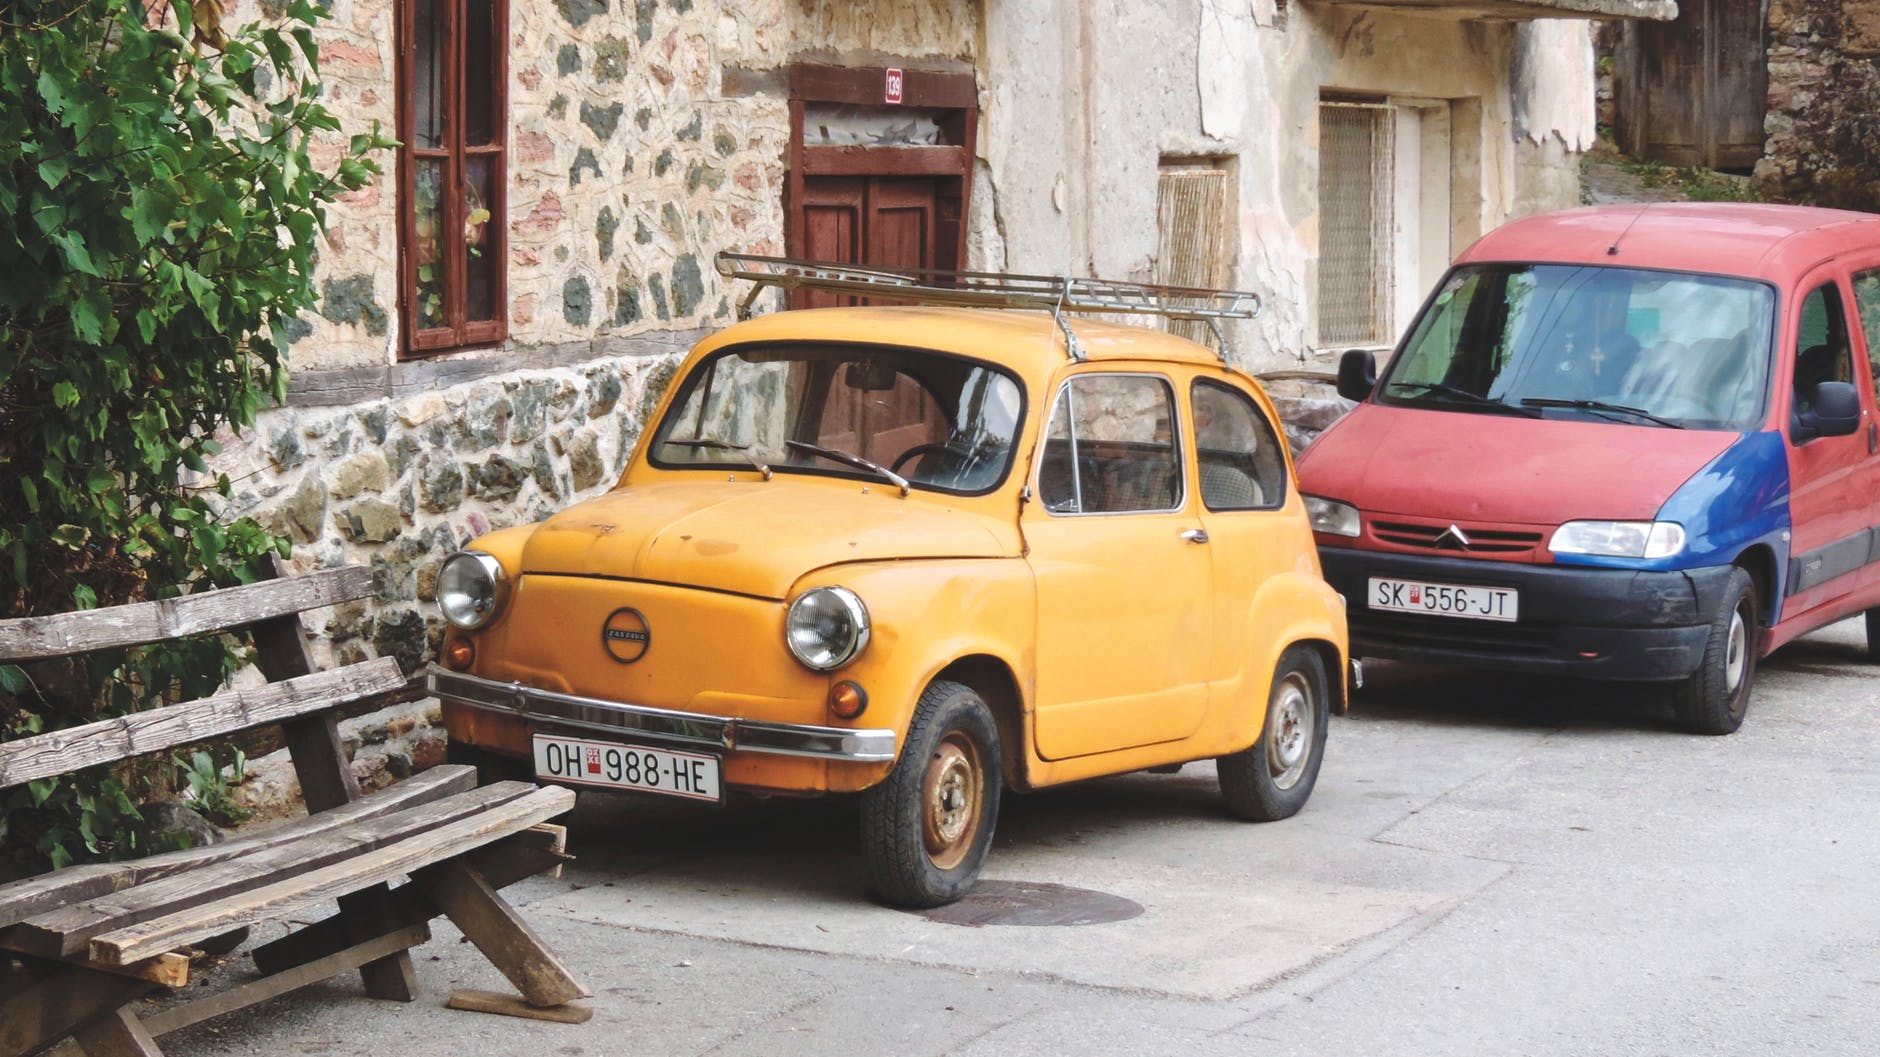 nissan old car vintage car matthias zomer